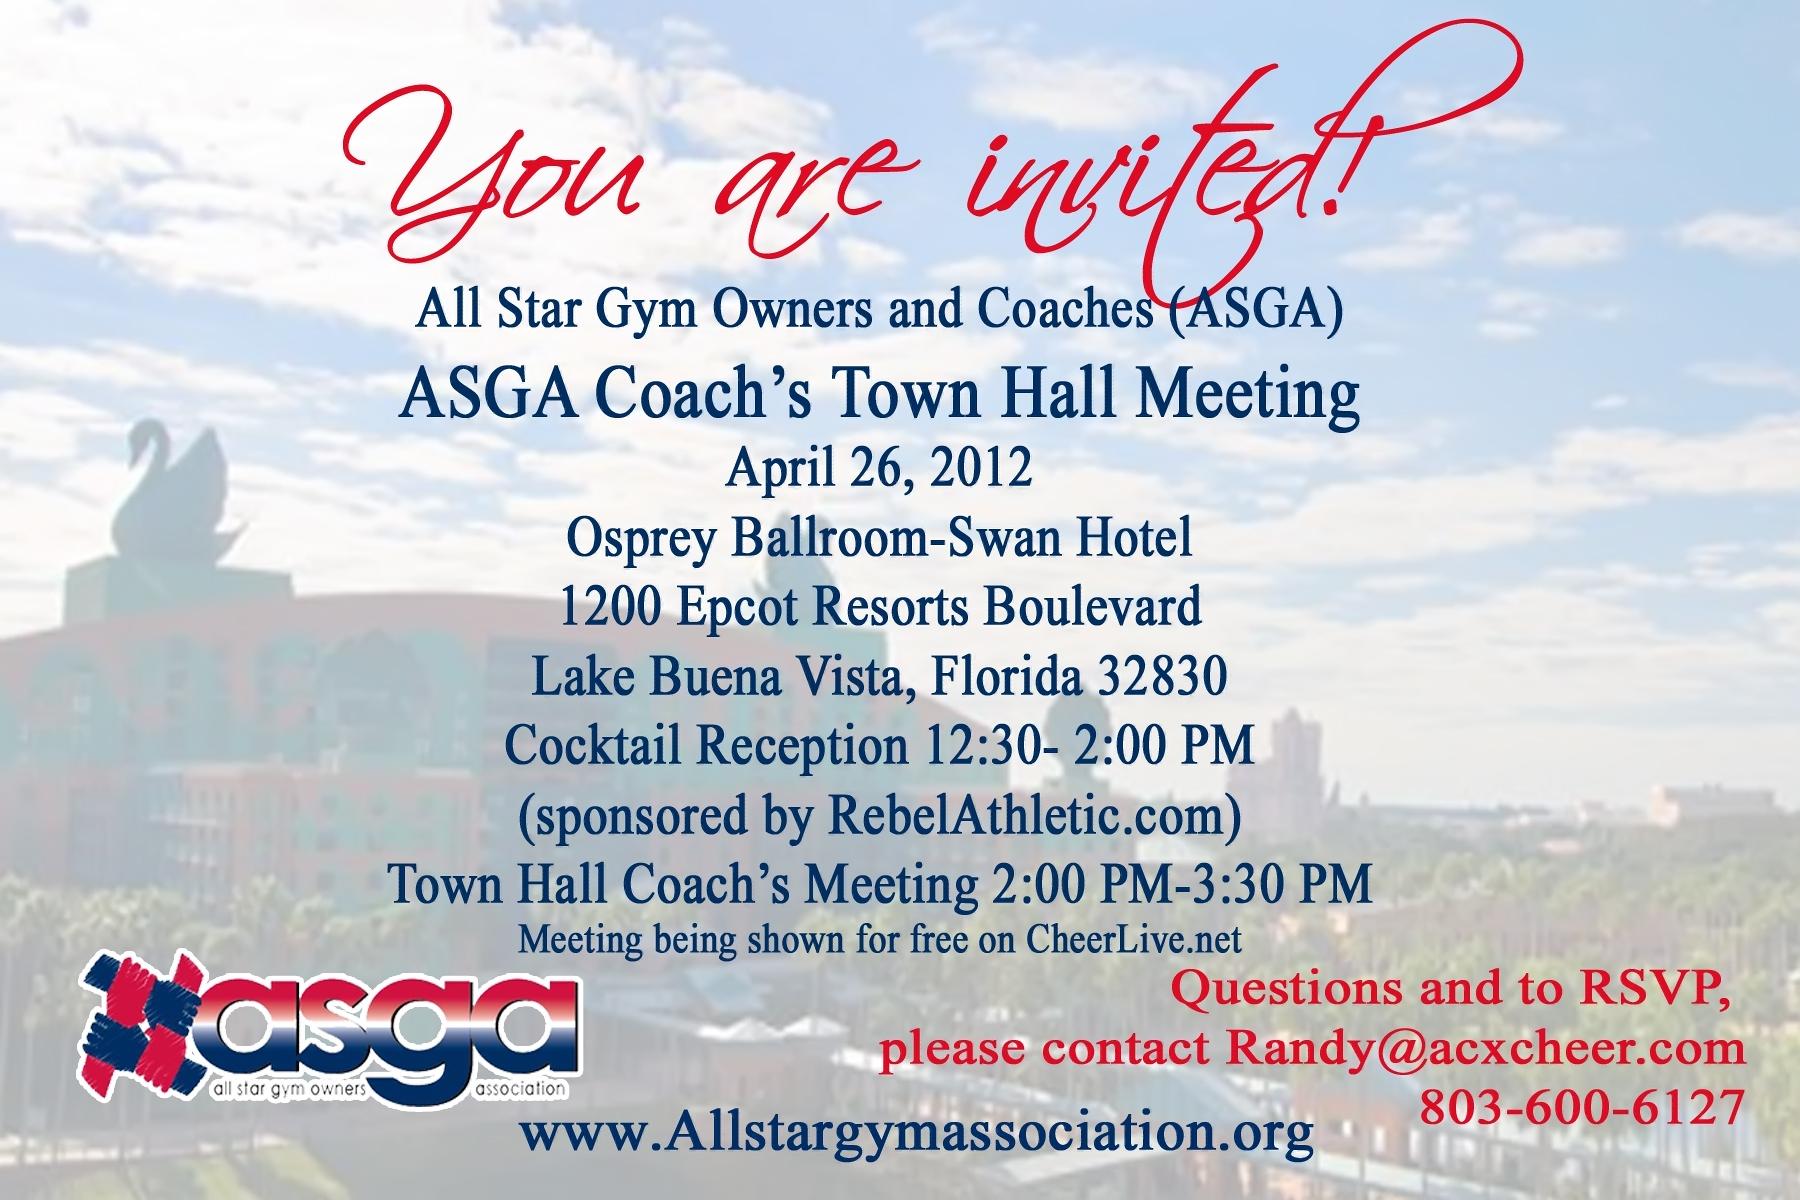 ASGA Town Hall Meeting Invitation